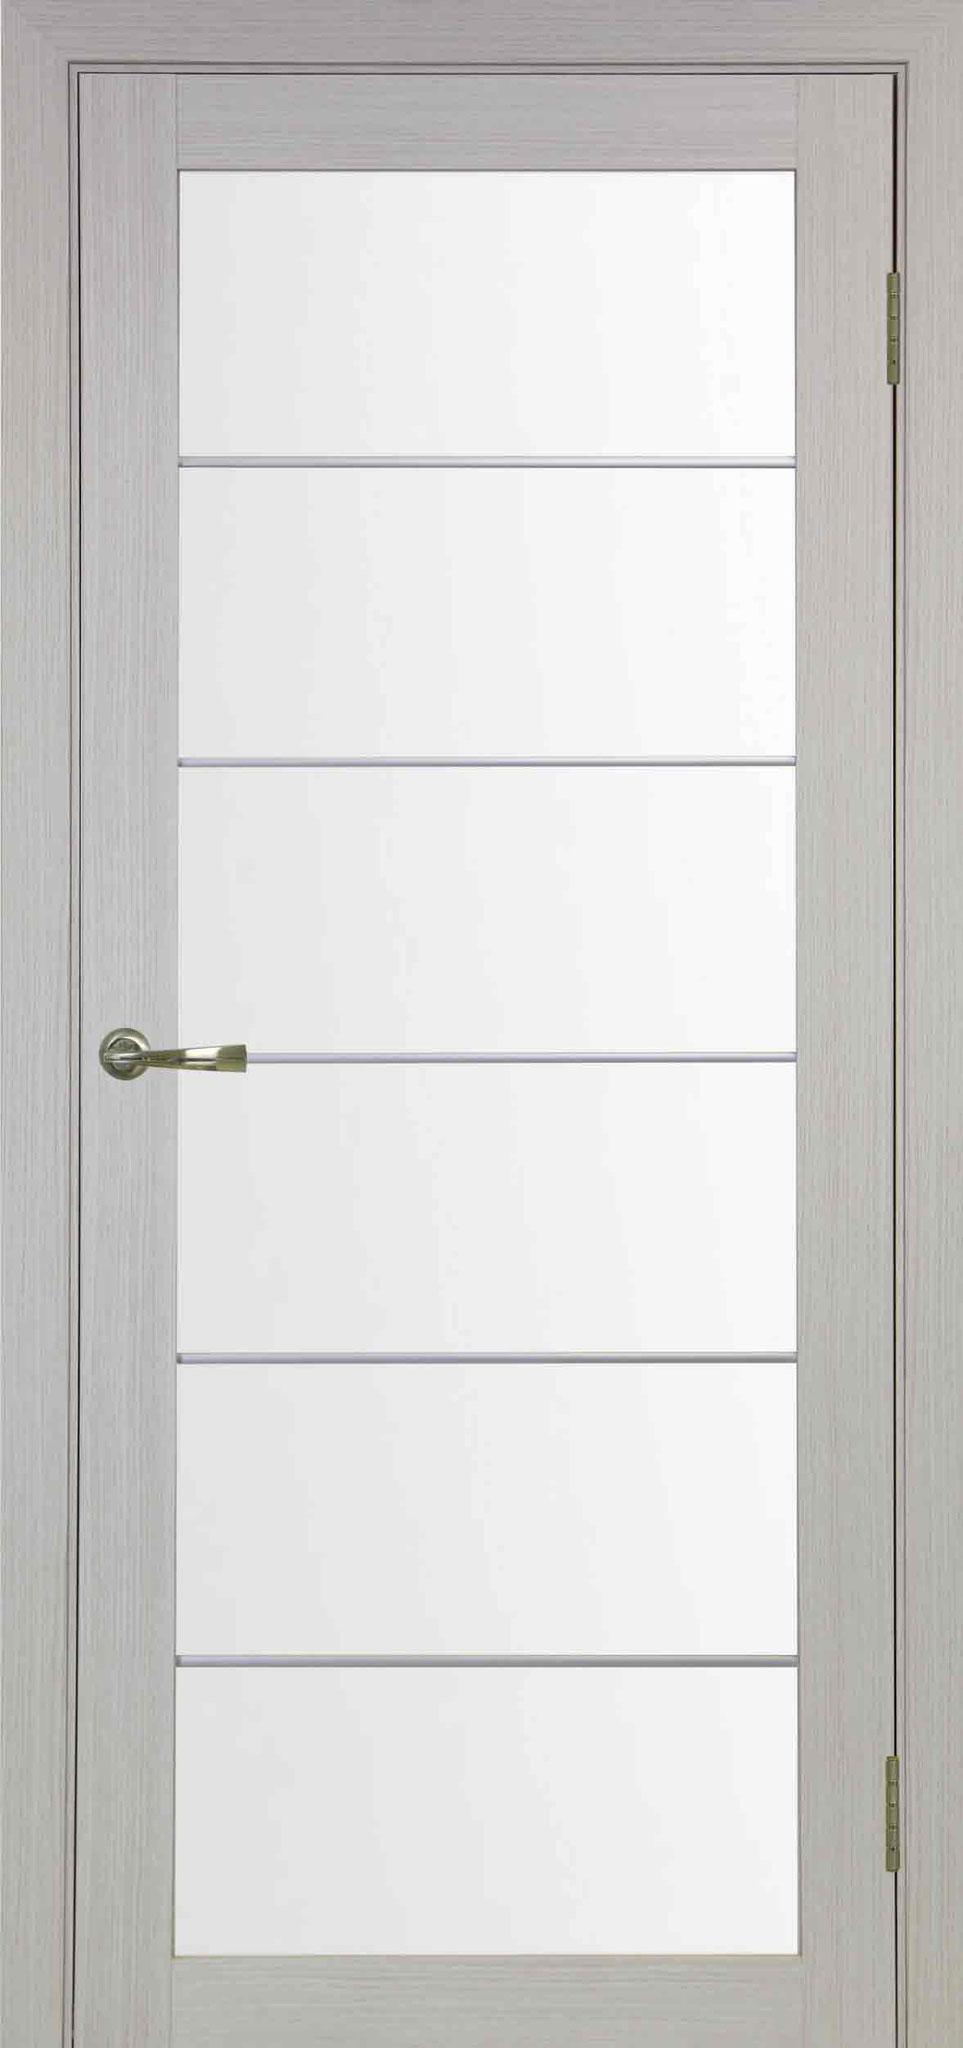 501.2 АСС белёный дуб, стекло сатин; молдинг, цвет: матовый хром